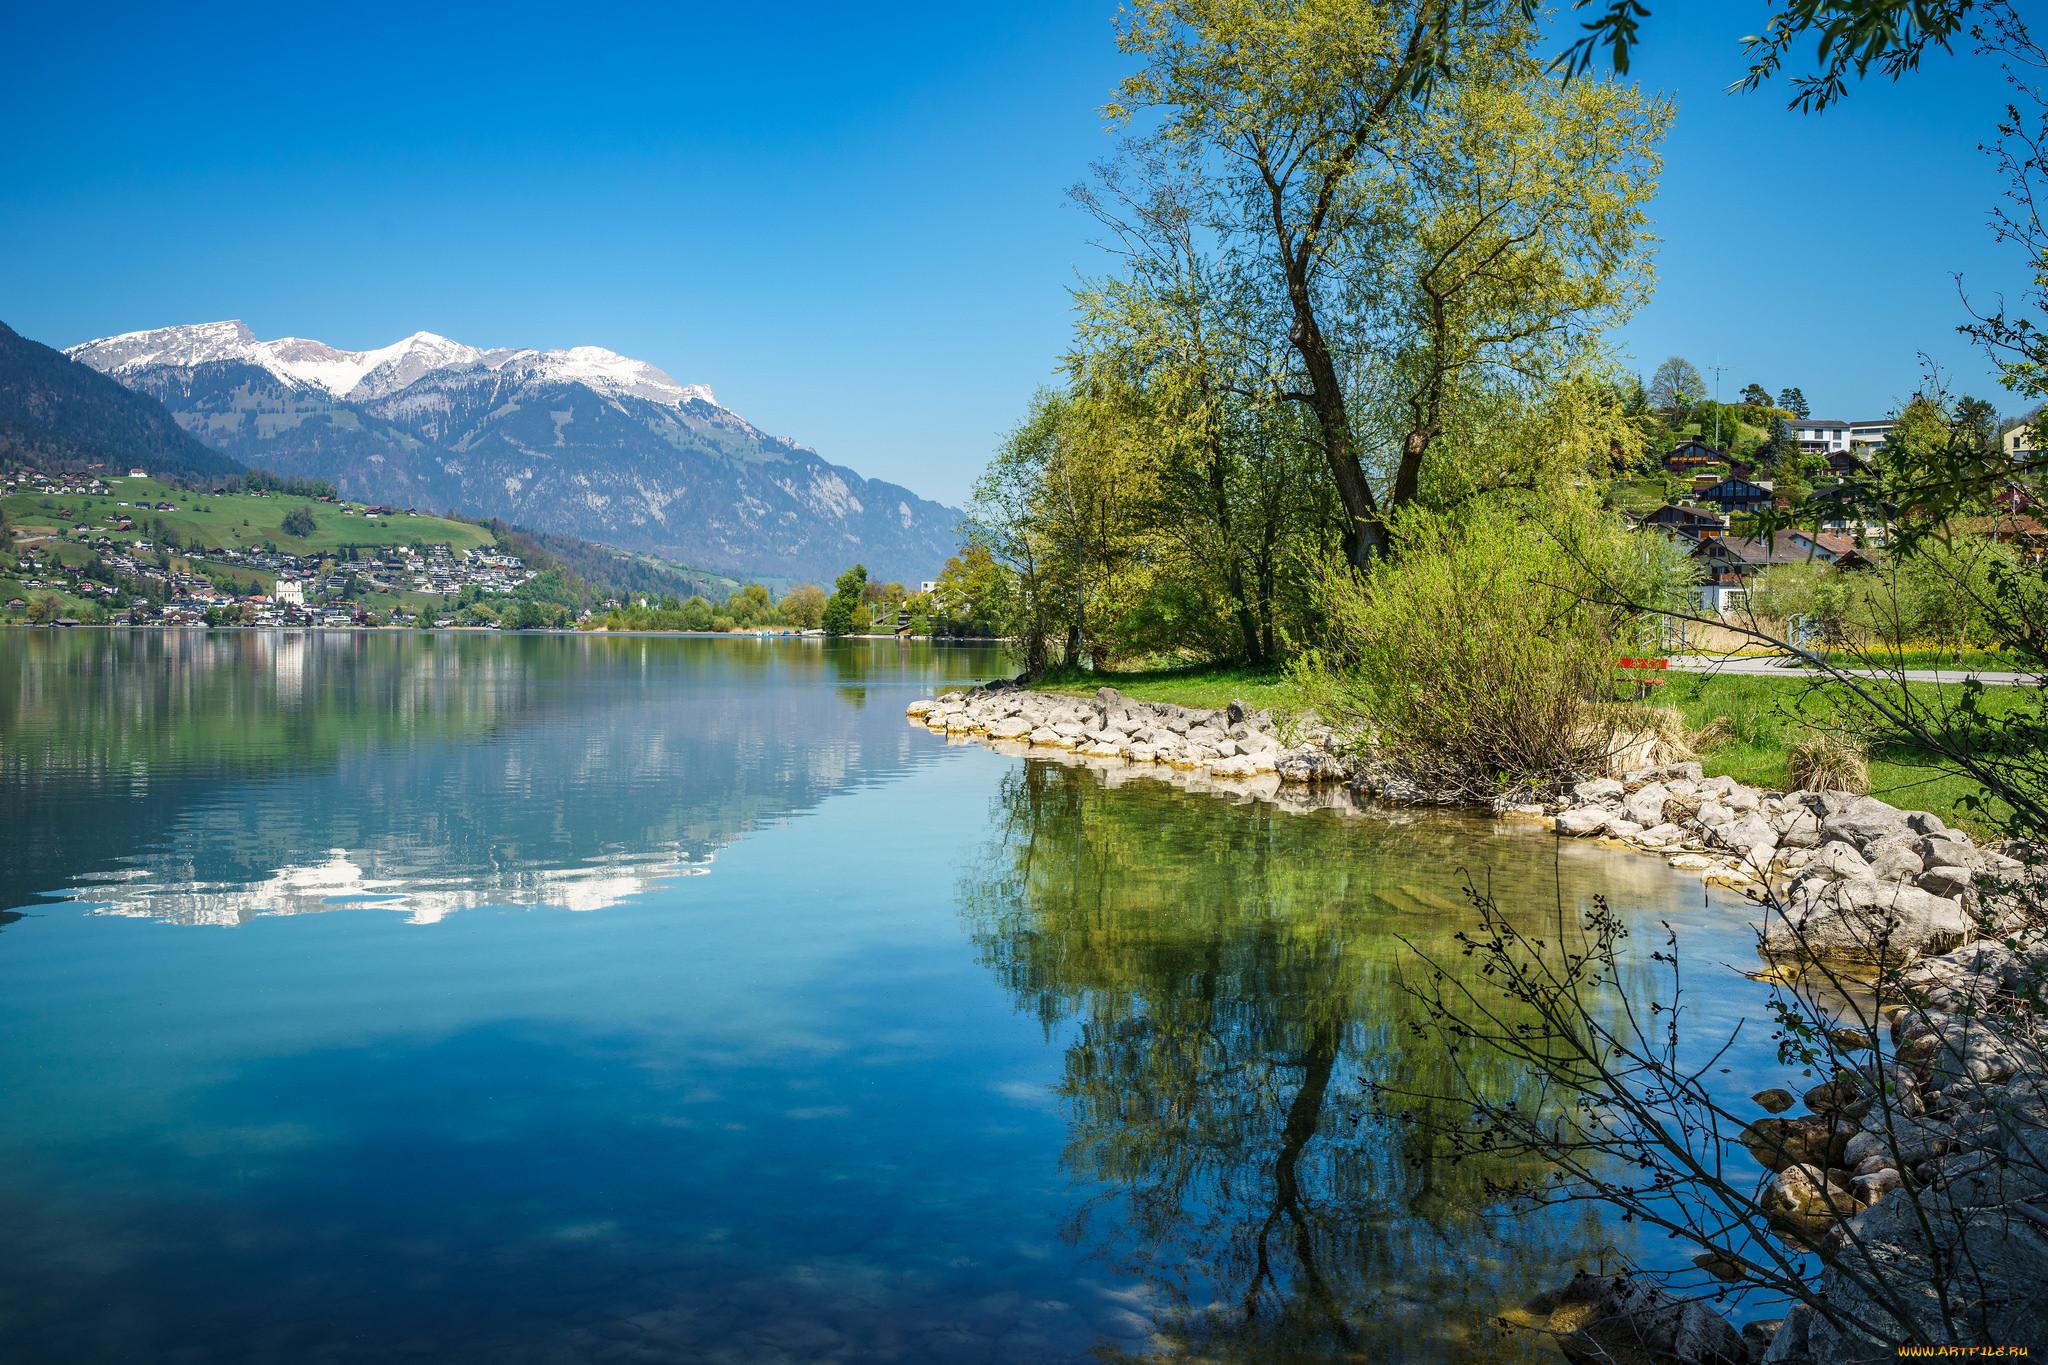 природа реки испании фото круто, что